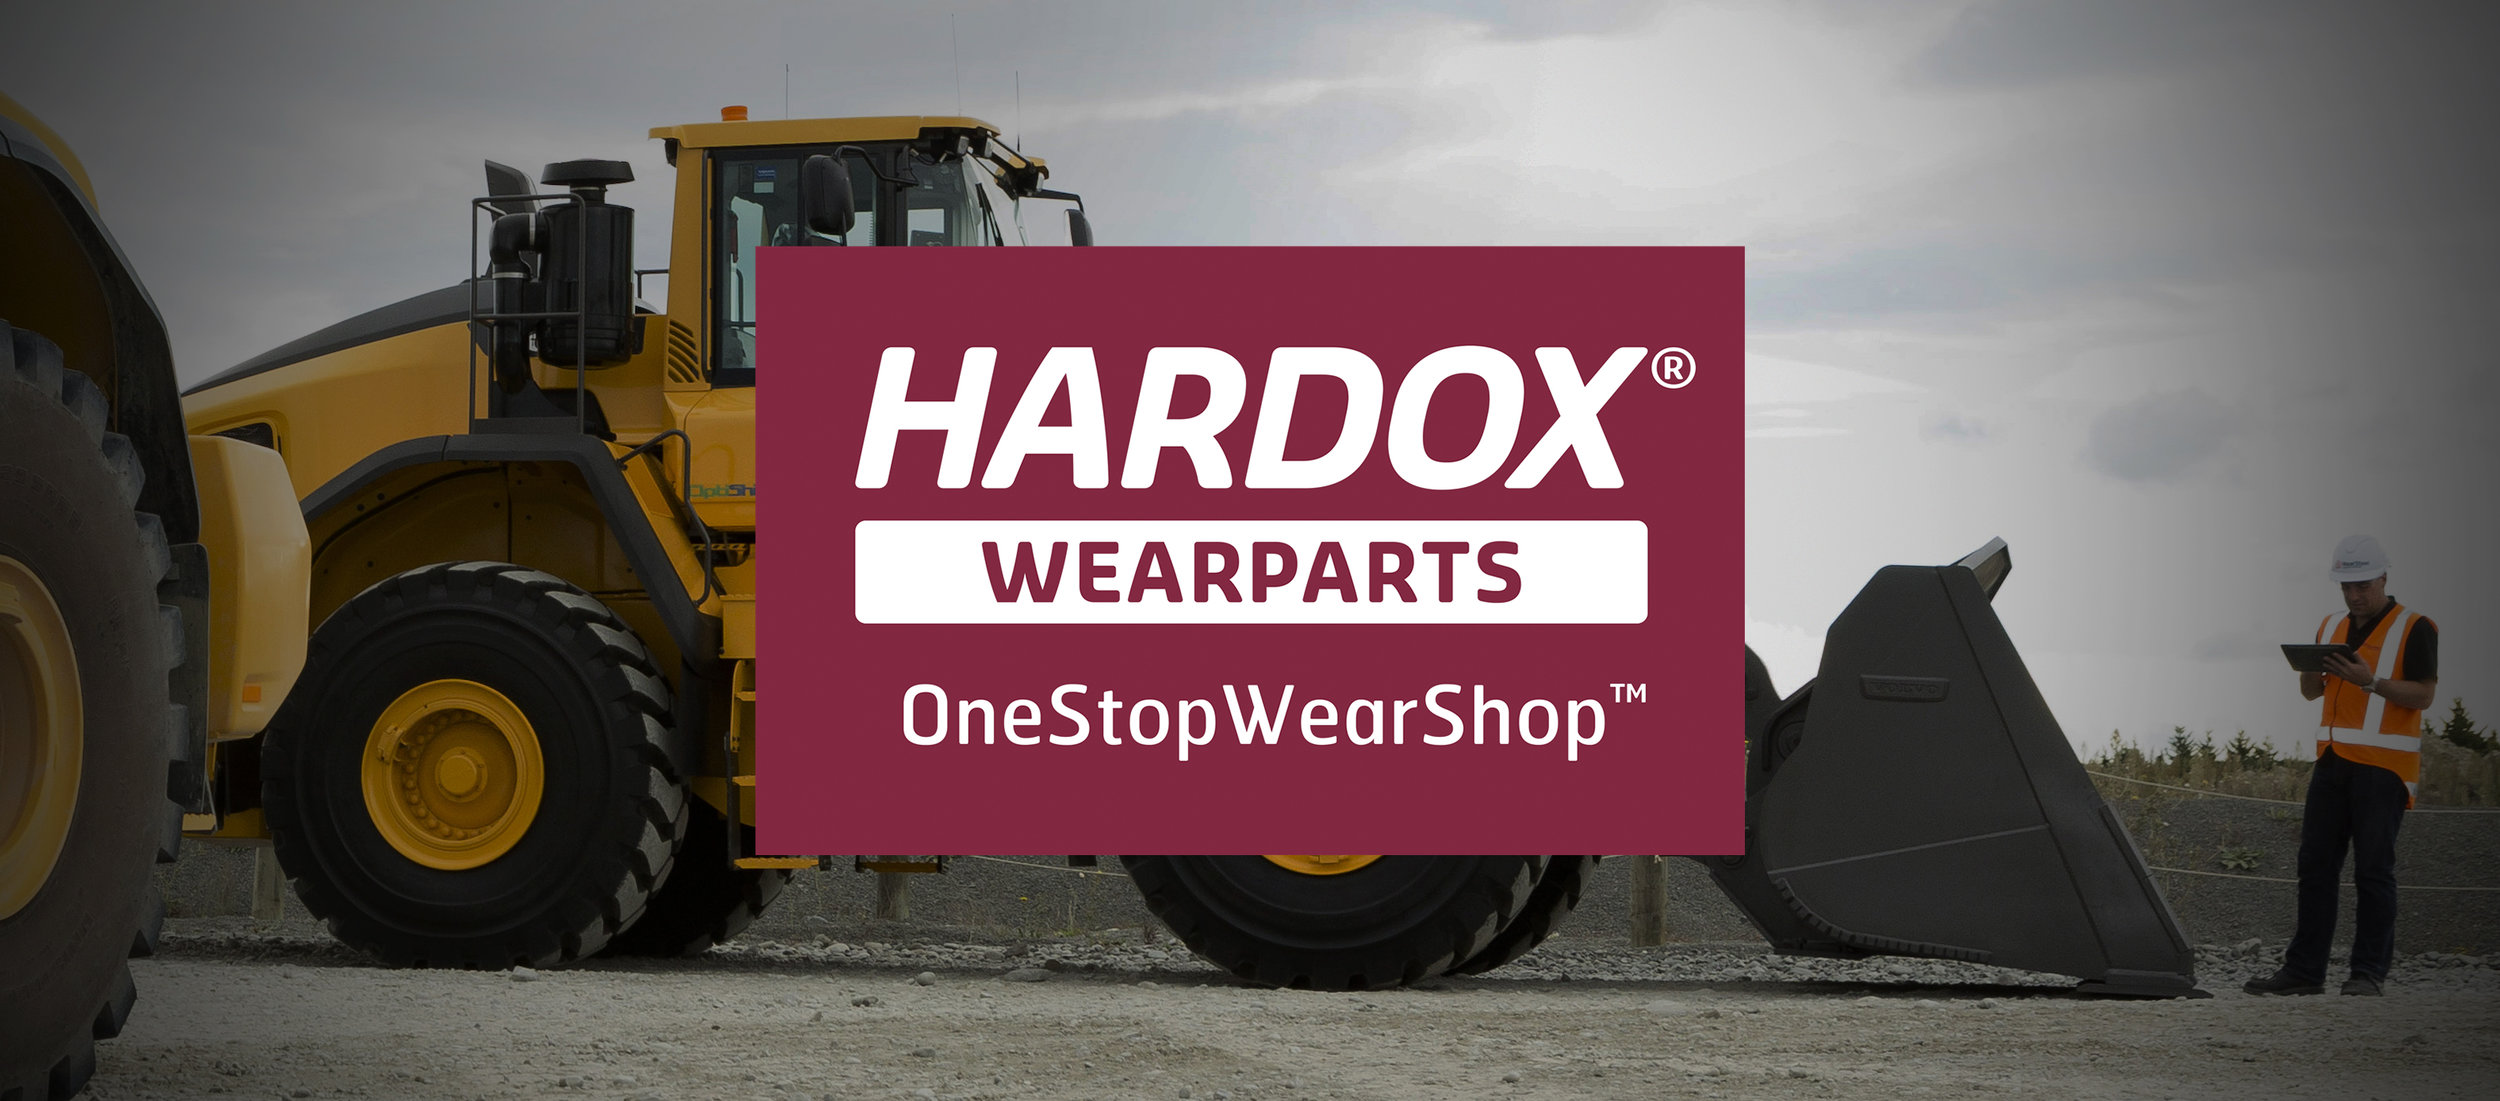 Hardox_Wearparts.jpg